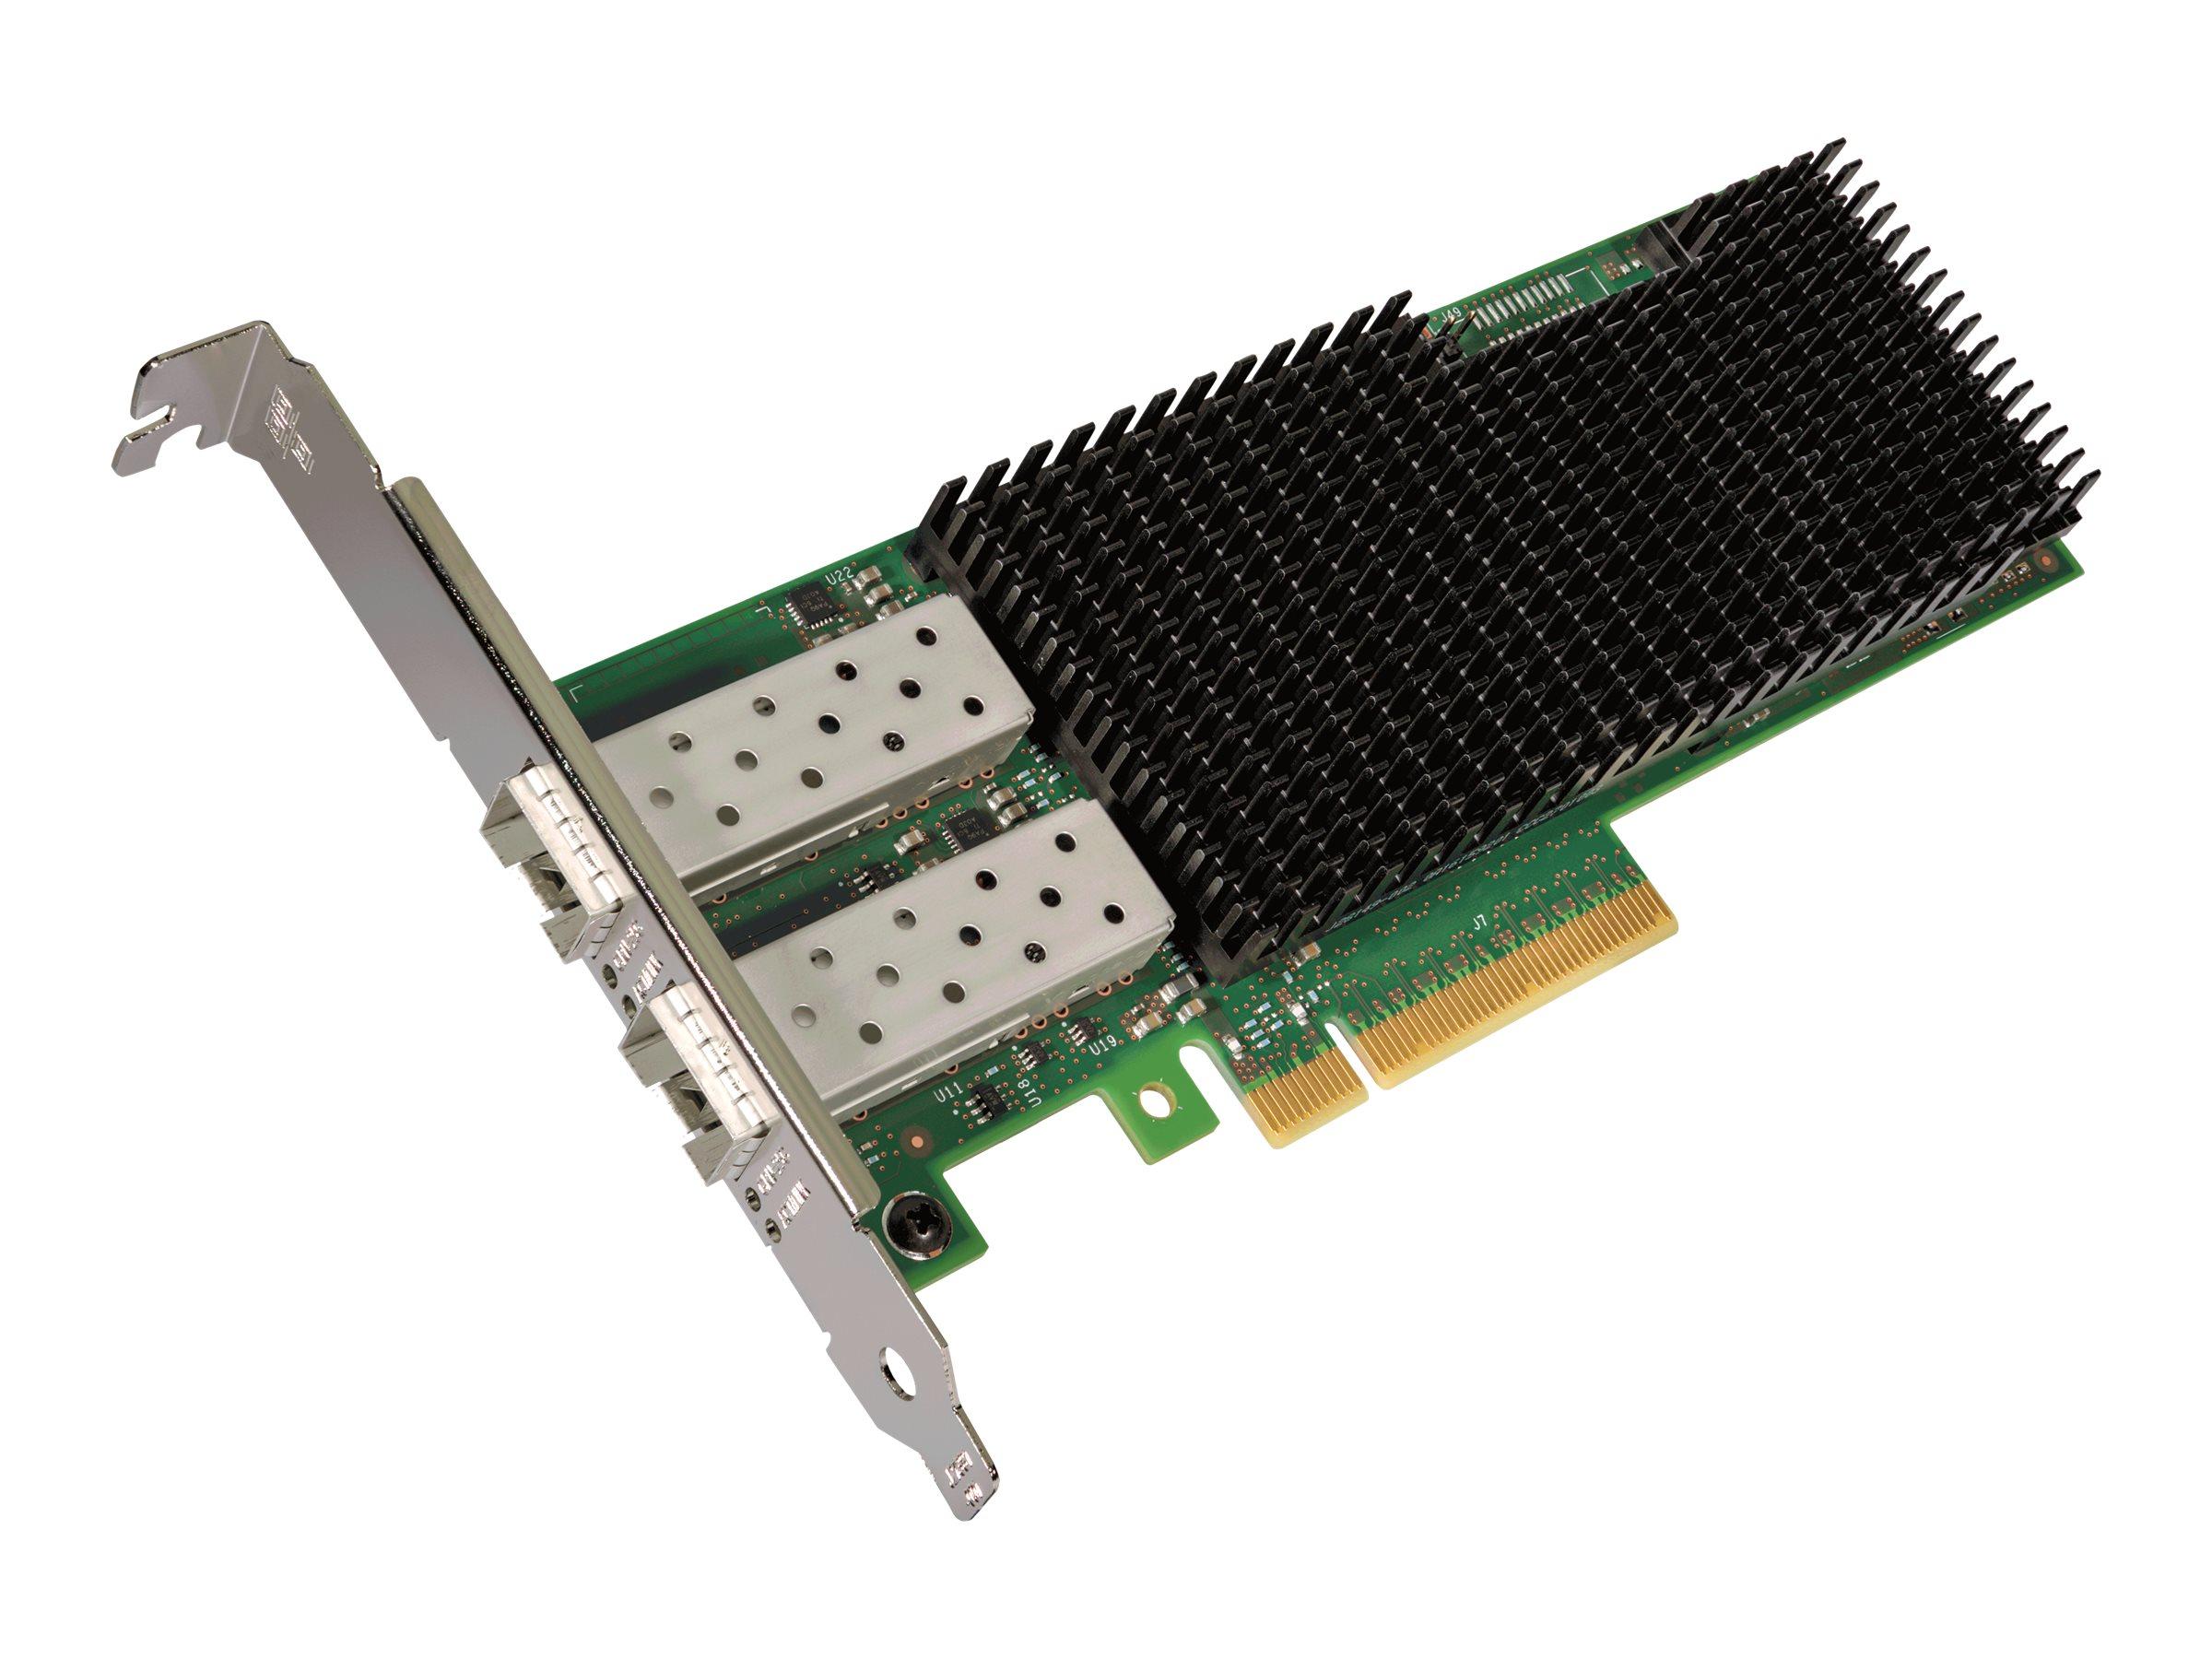 Intel Ethernet Network Adapter XXV710-DA2 - network adapter - PCIe 3.0 x8 - 25 Gigabit SFP28 x 2